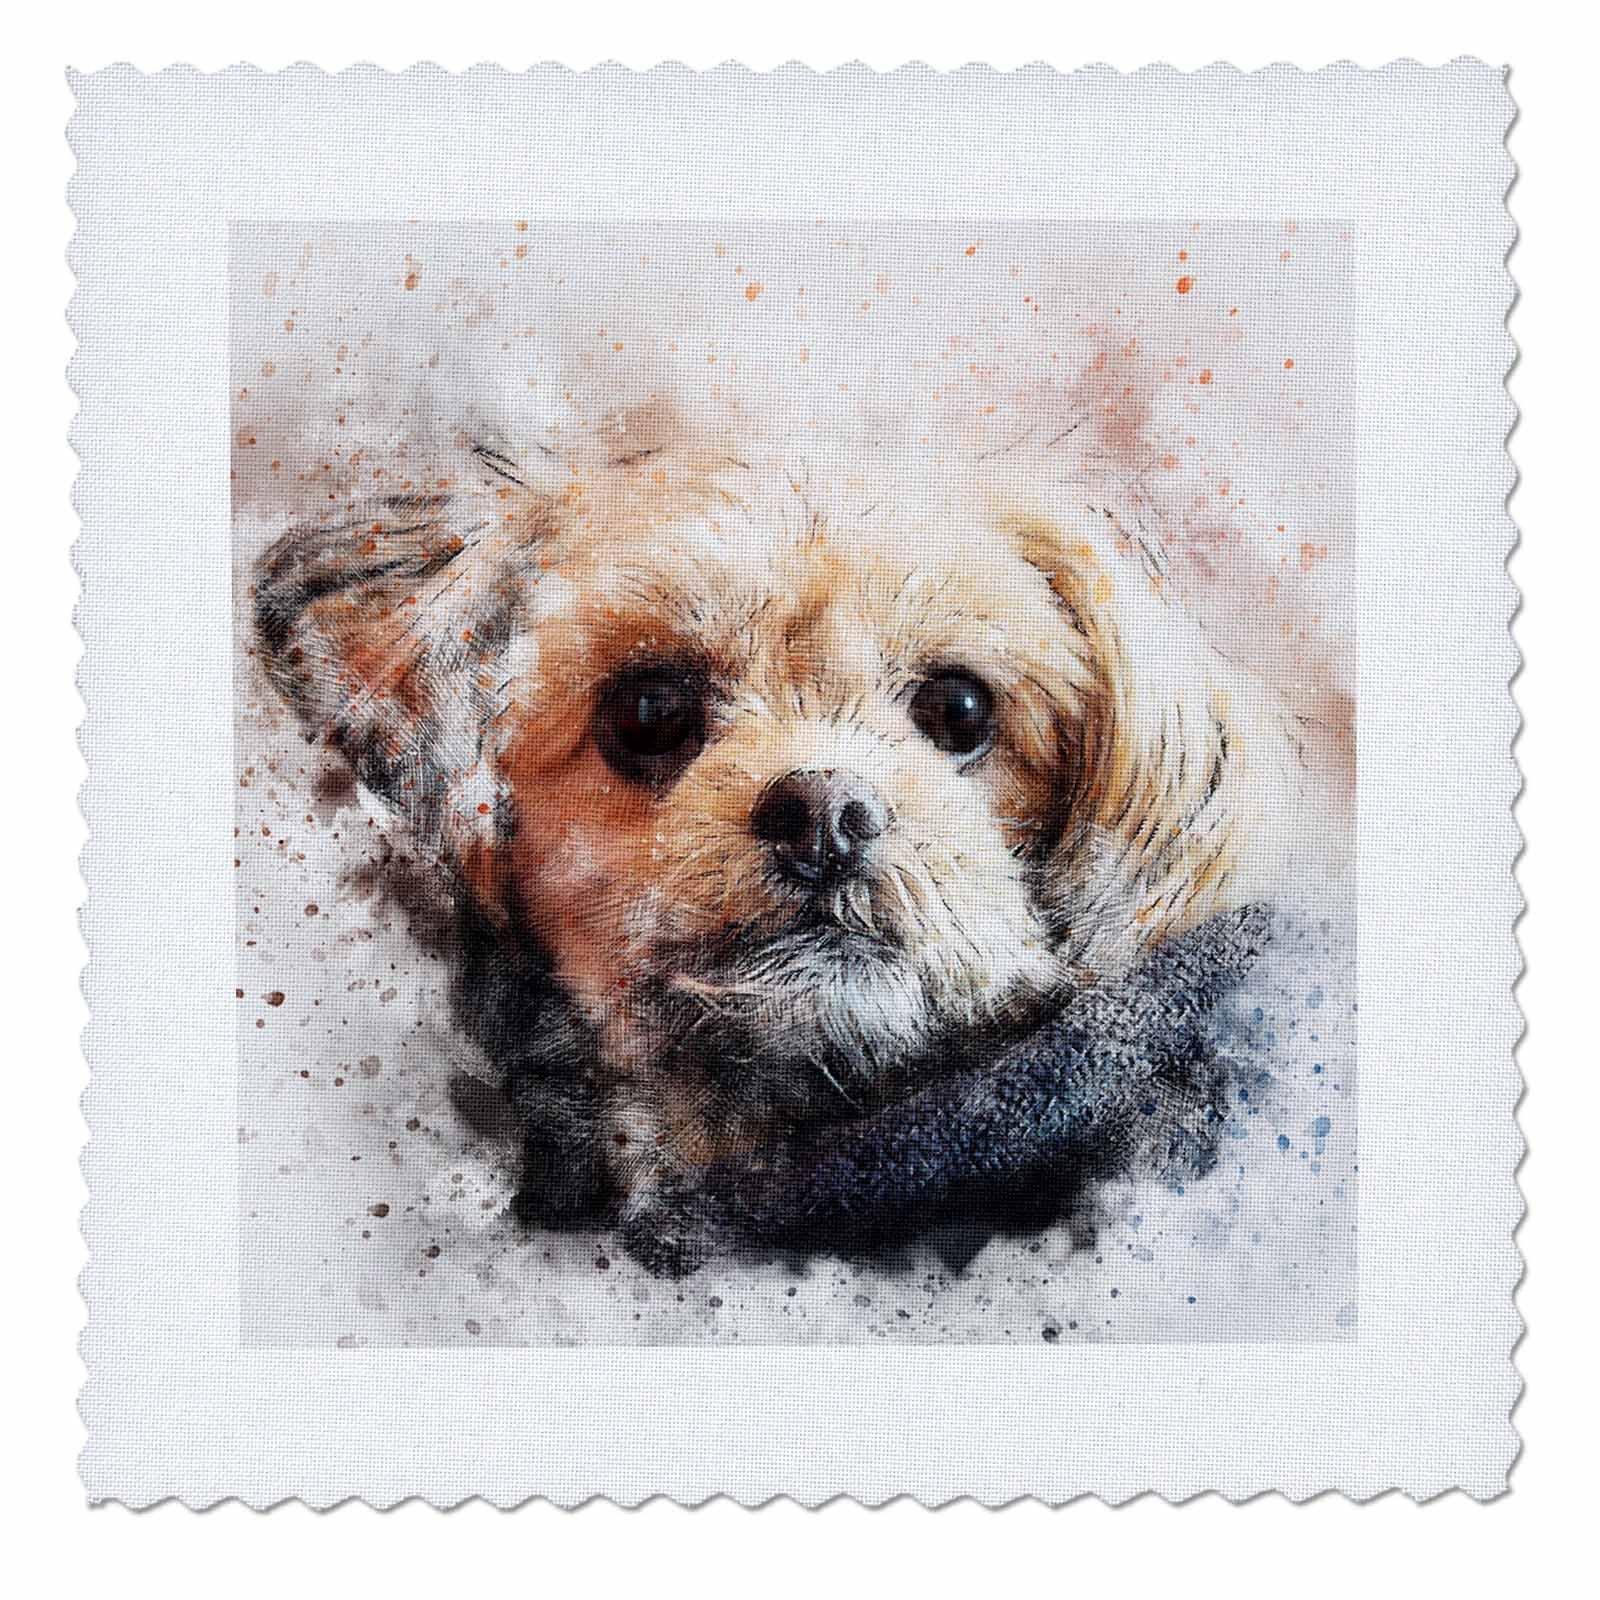 3dRose Sven Herkenrath Animal - Funny Dog Portrait - 25x25 inch quilt square (qs_280297_10)